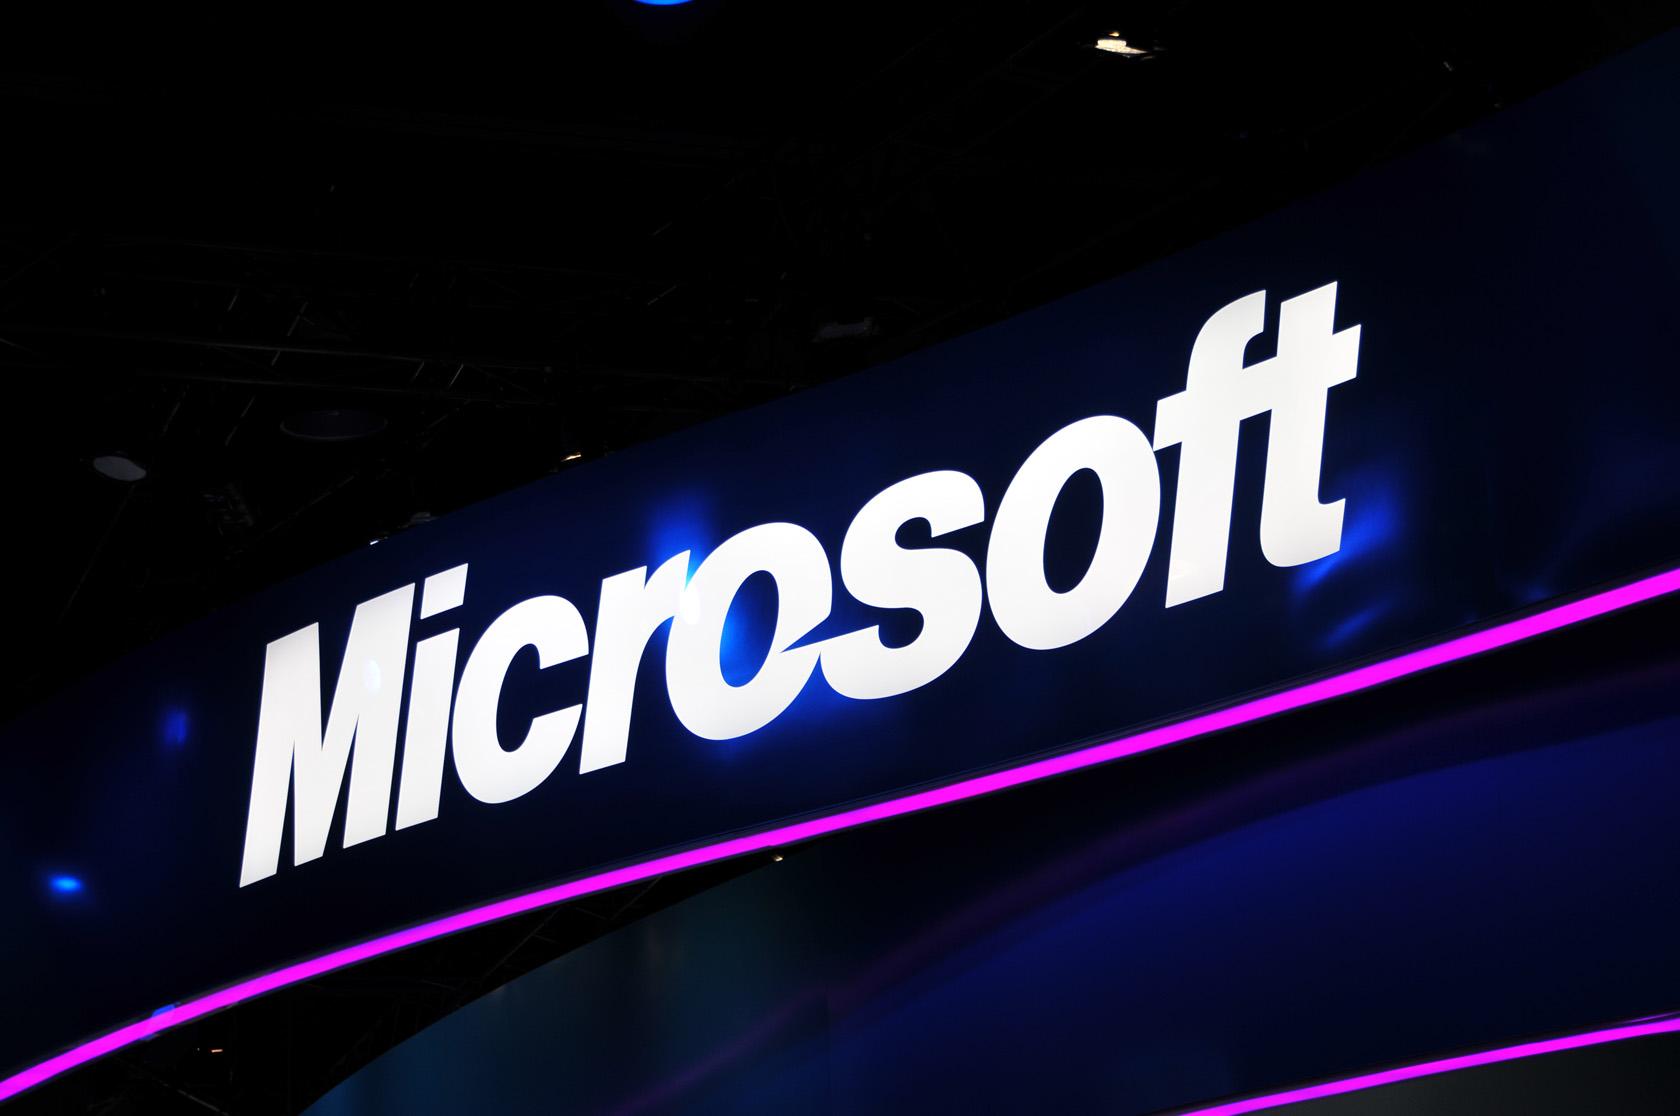 Démonstration de Microsoft Windows Embedded 7